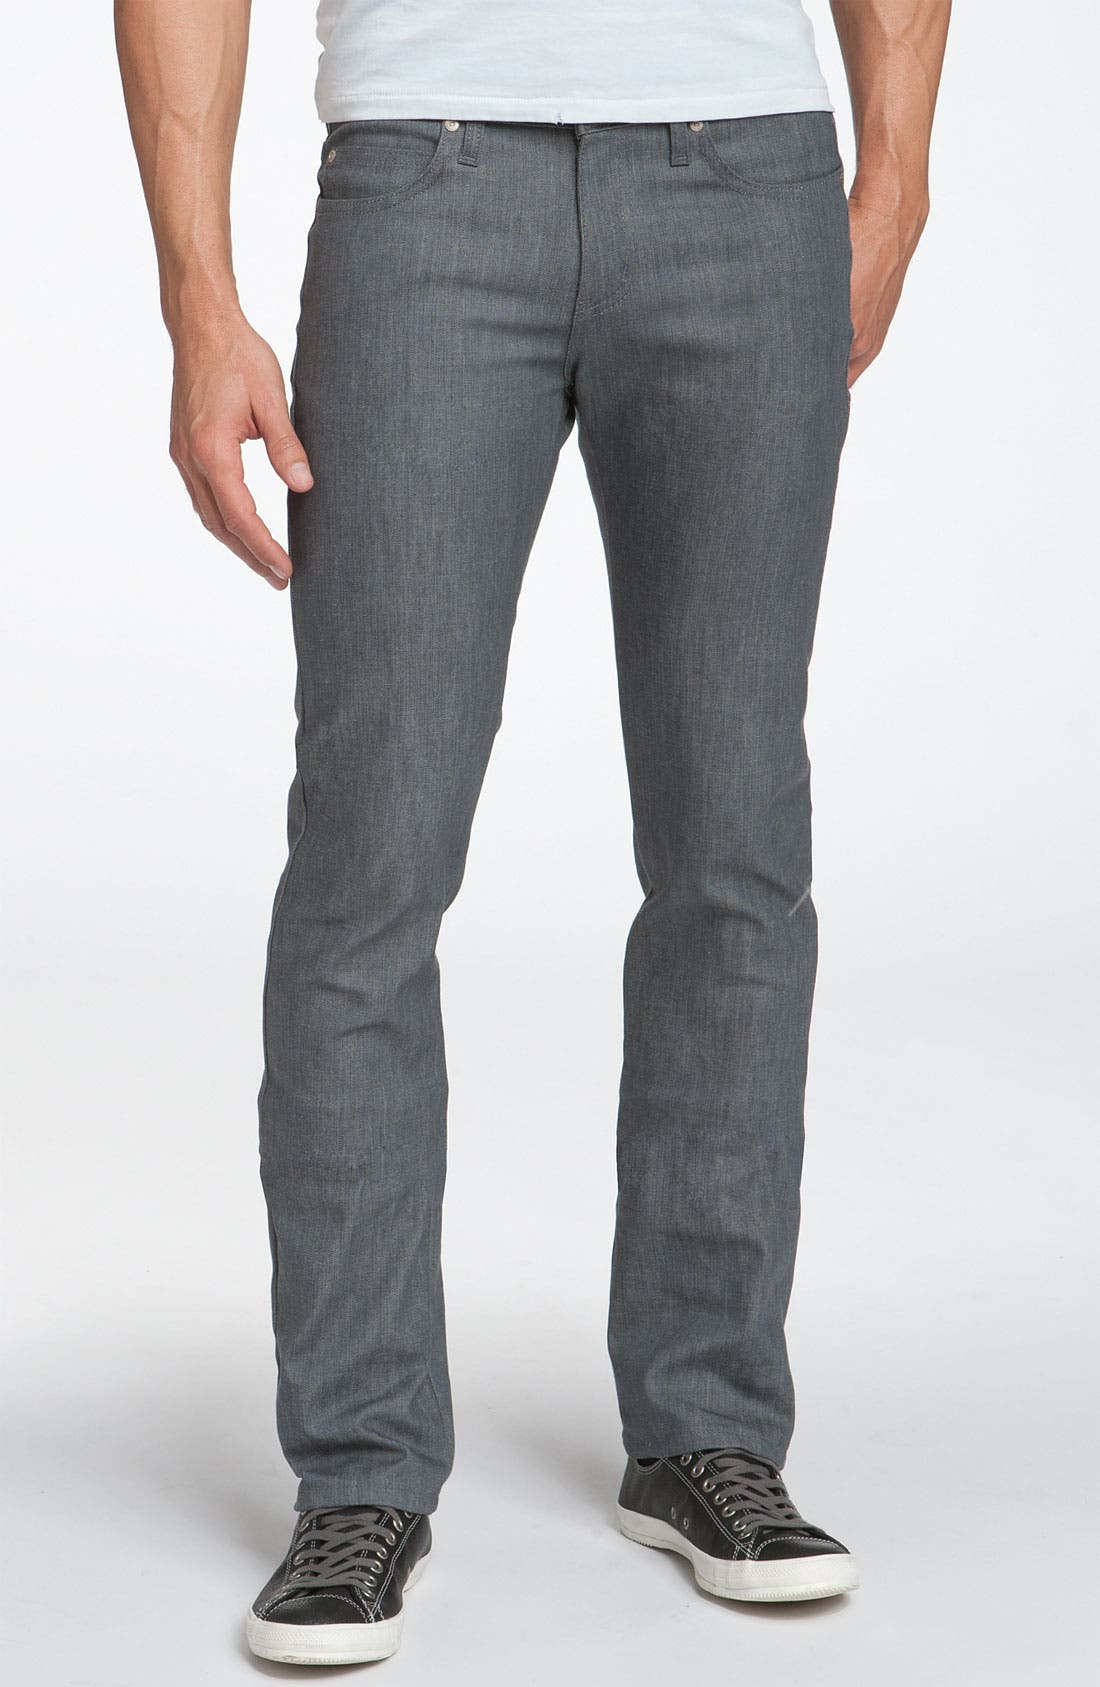 Main Image - Naked & Famous Denim 'Skinny Guy' Skinny Fit Jeans (Grey Stretch Wash)